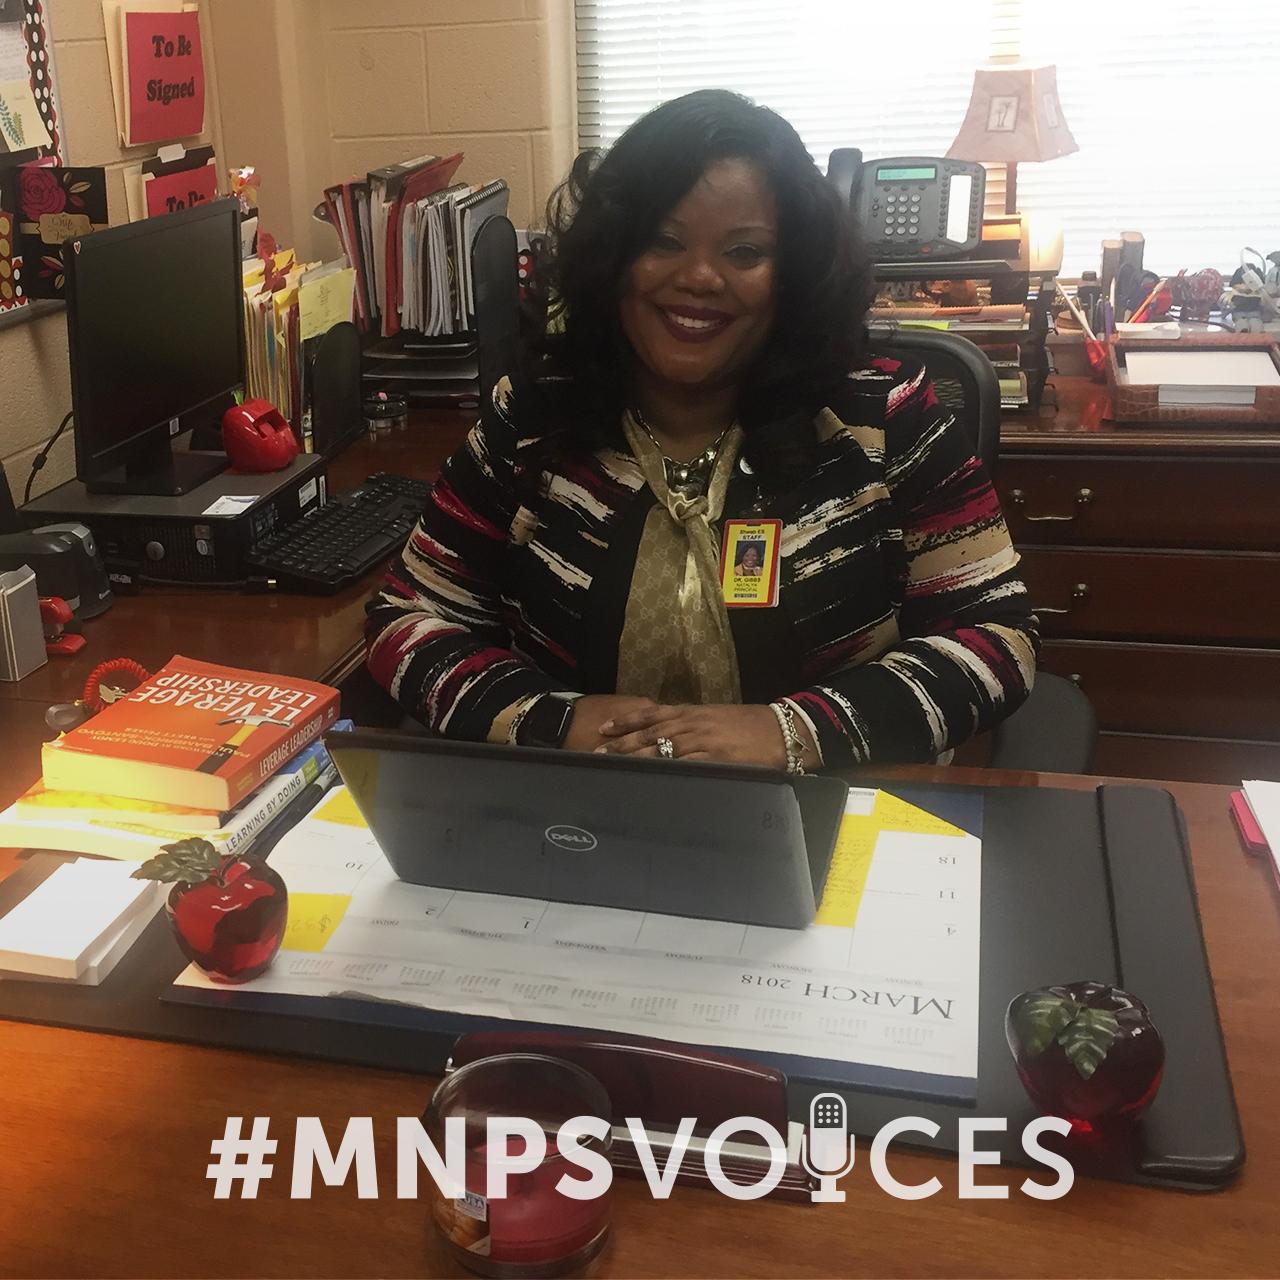 MNPSVoices_041118_NatalynGibbs